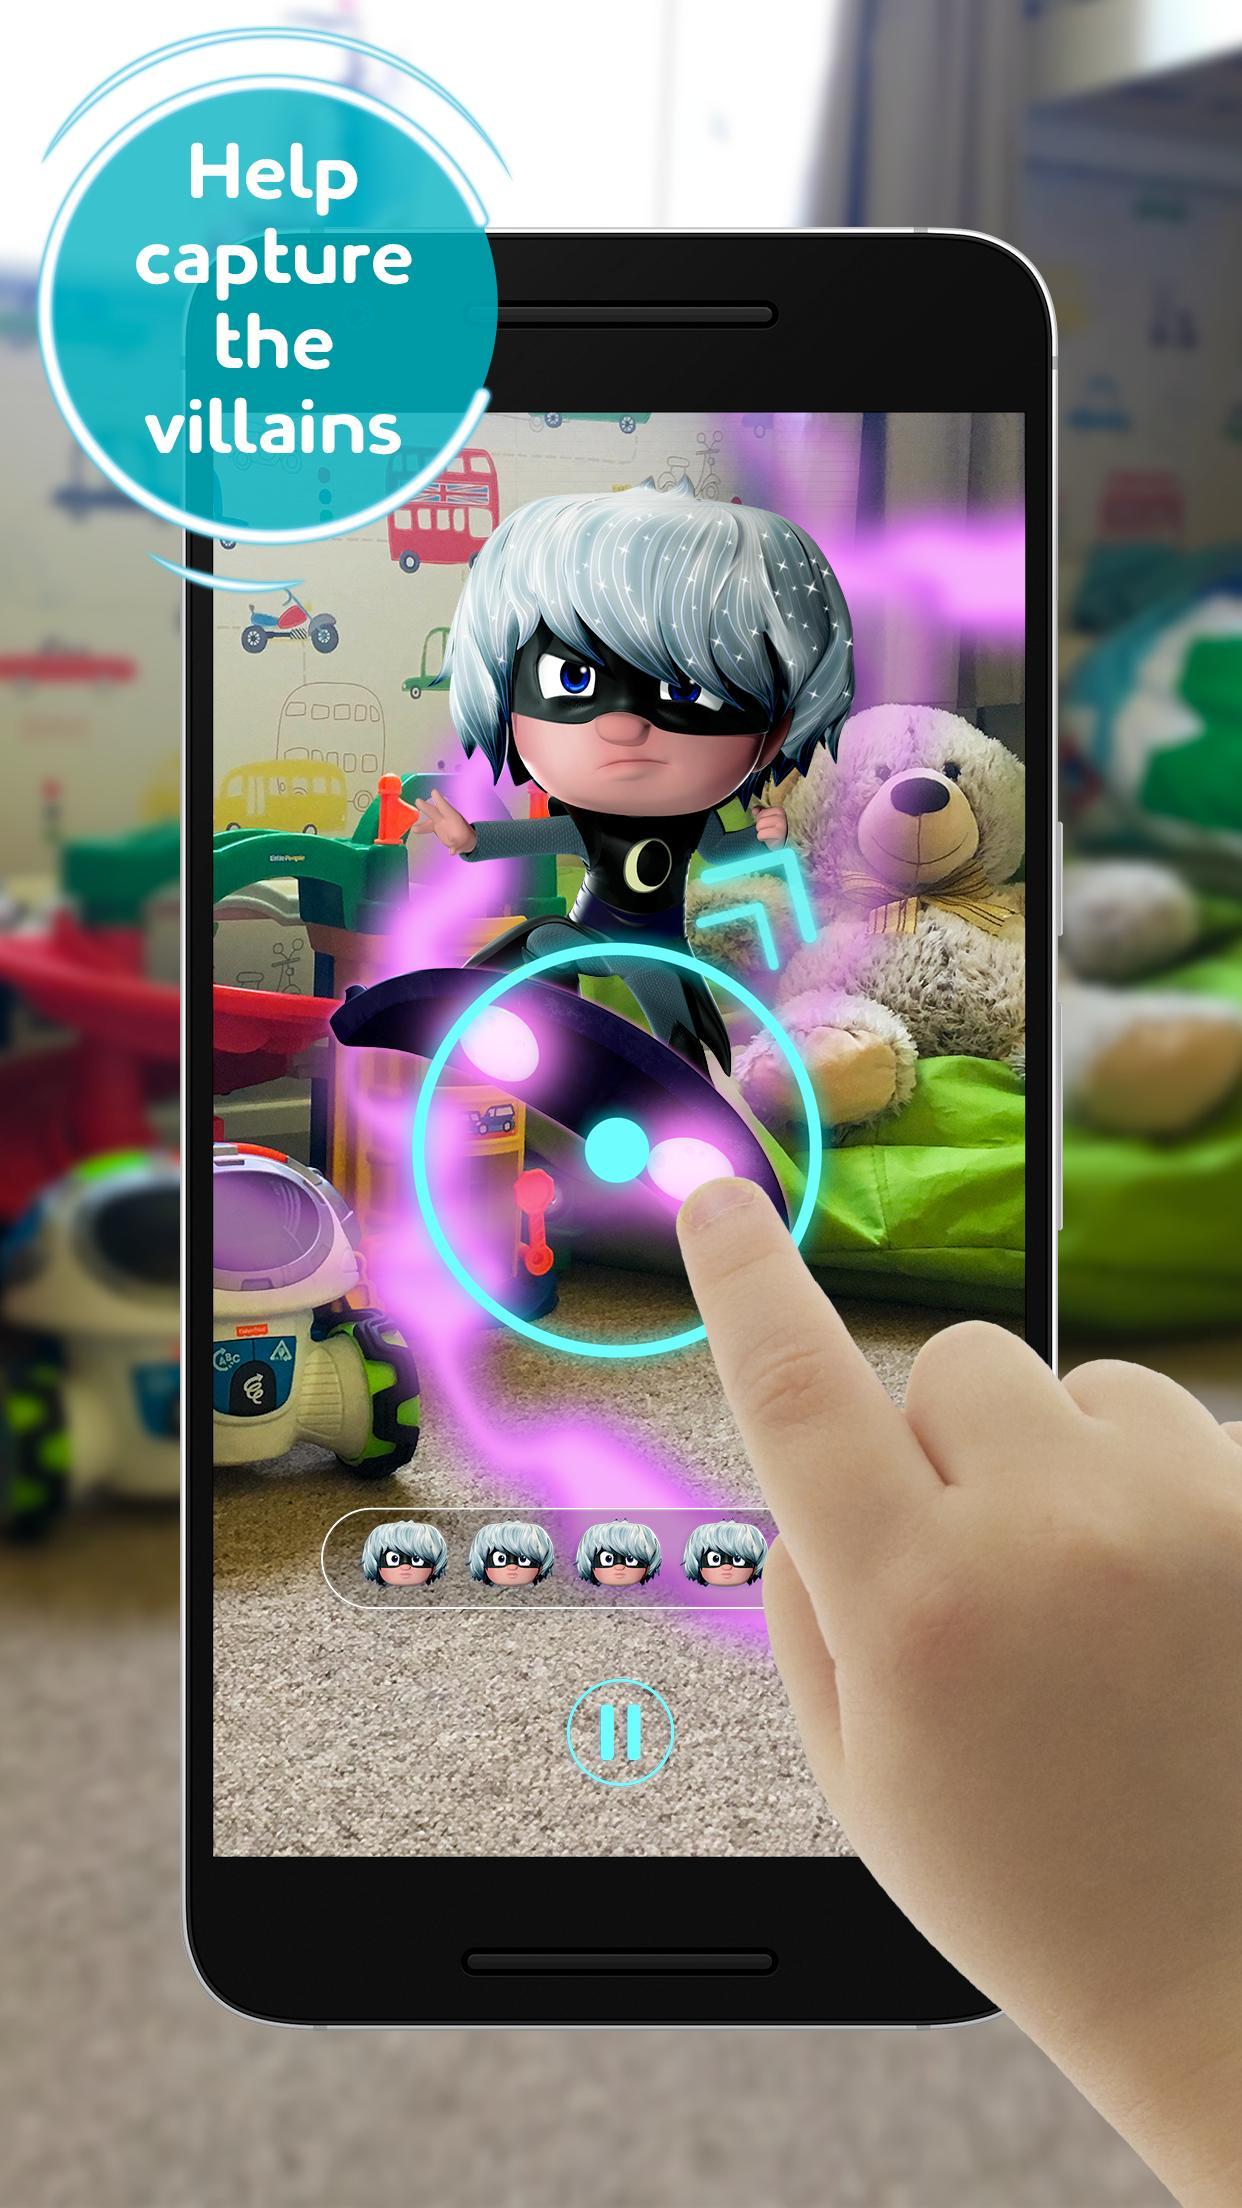 PJ Masks Time To Be A Hero 2.1.2 Screenshot 4